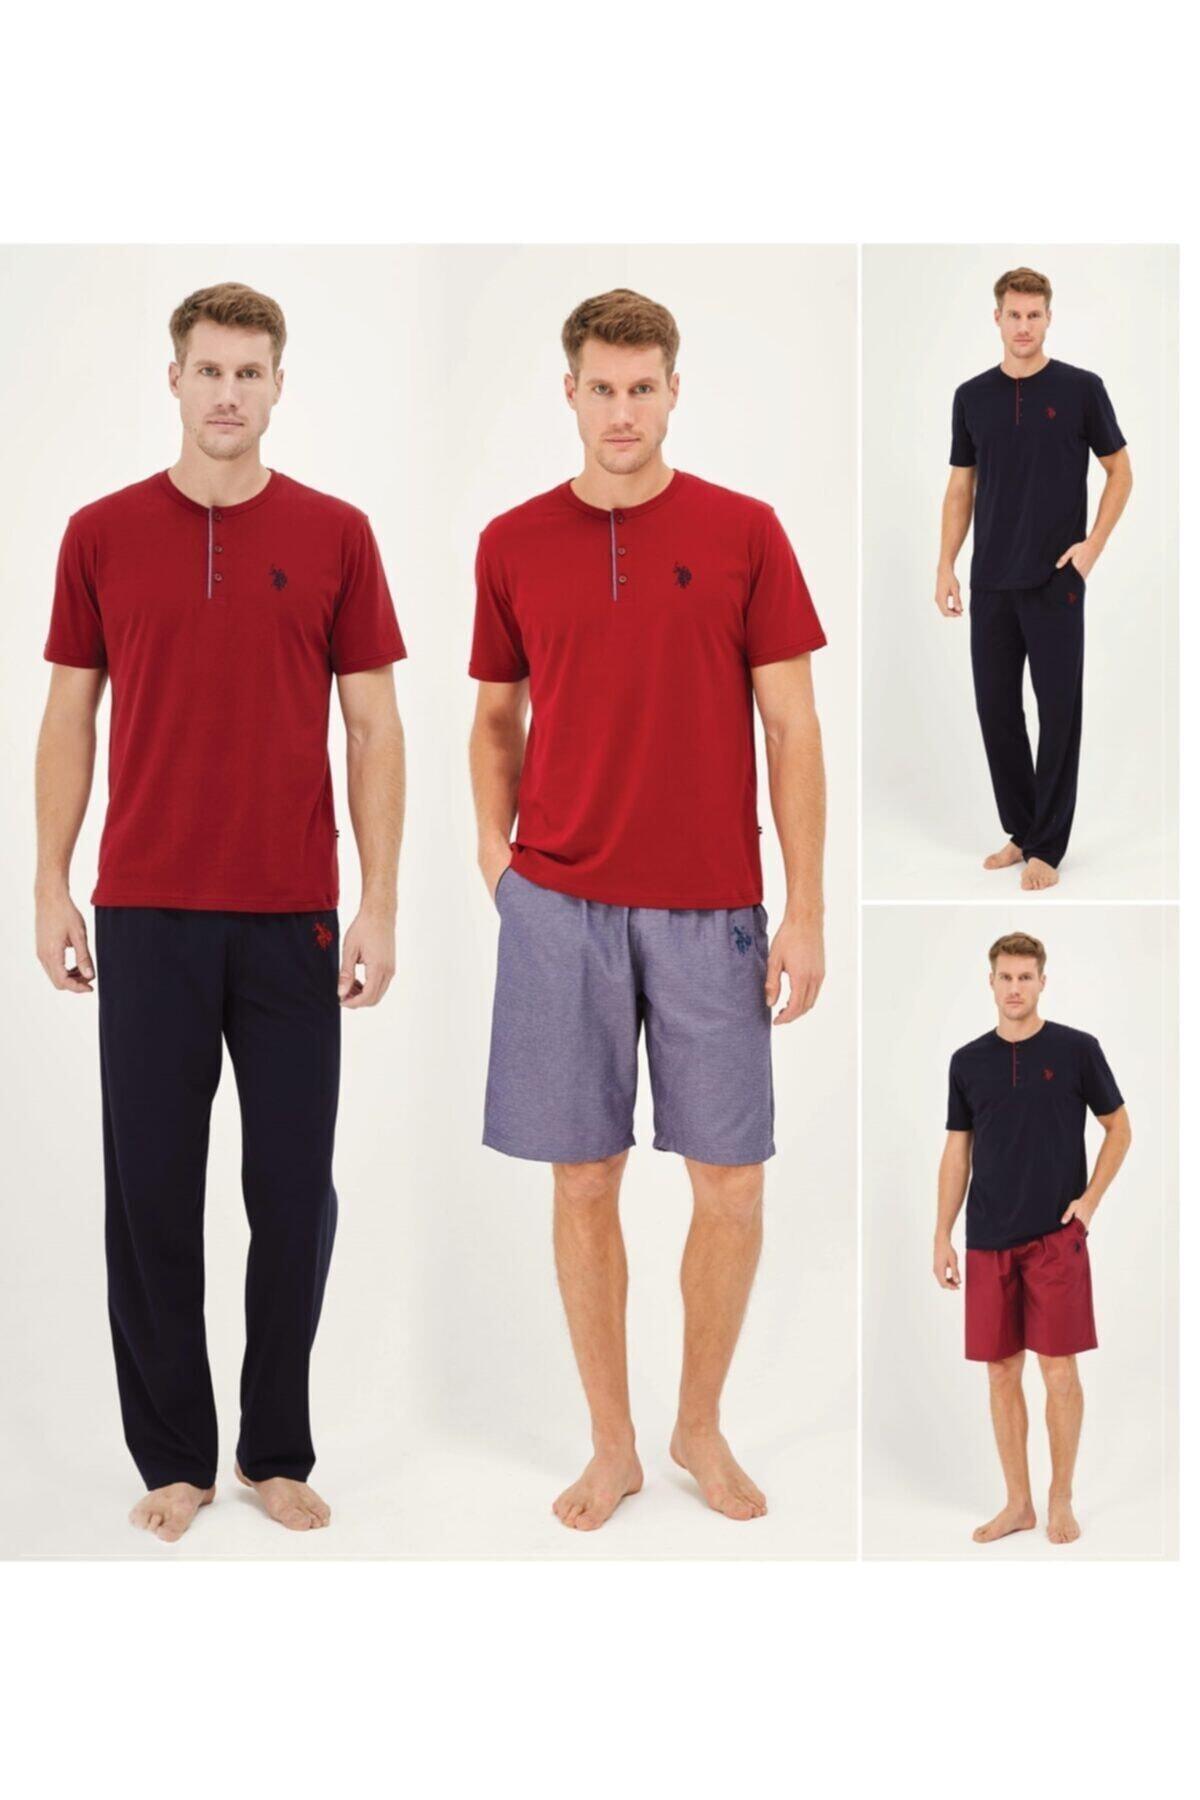 U.S. Polo Assn. Us Polo Lacivert Pijama Takım + Sort 12010 2